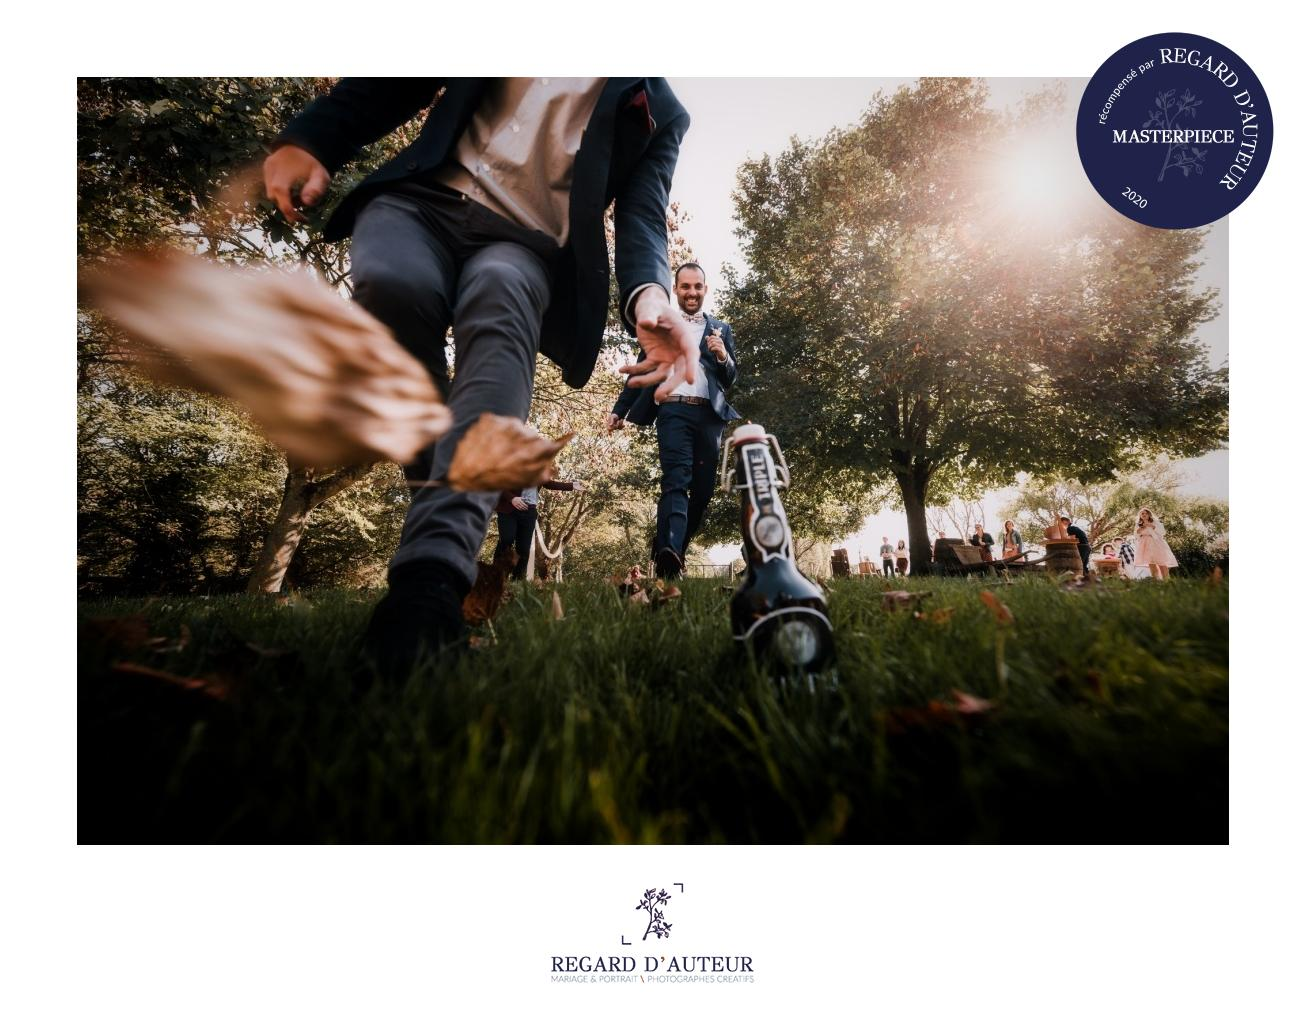 Novembre 2020 : 5 photos de mariage récompensées